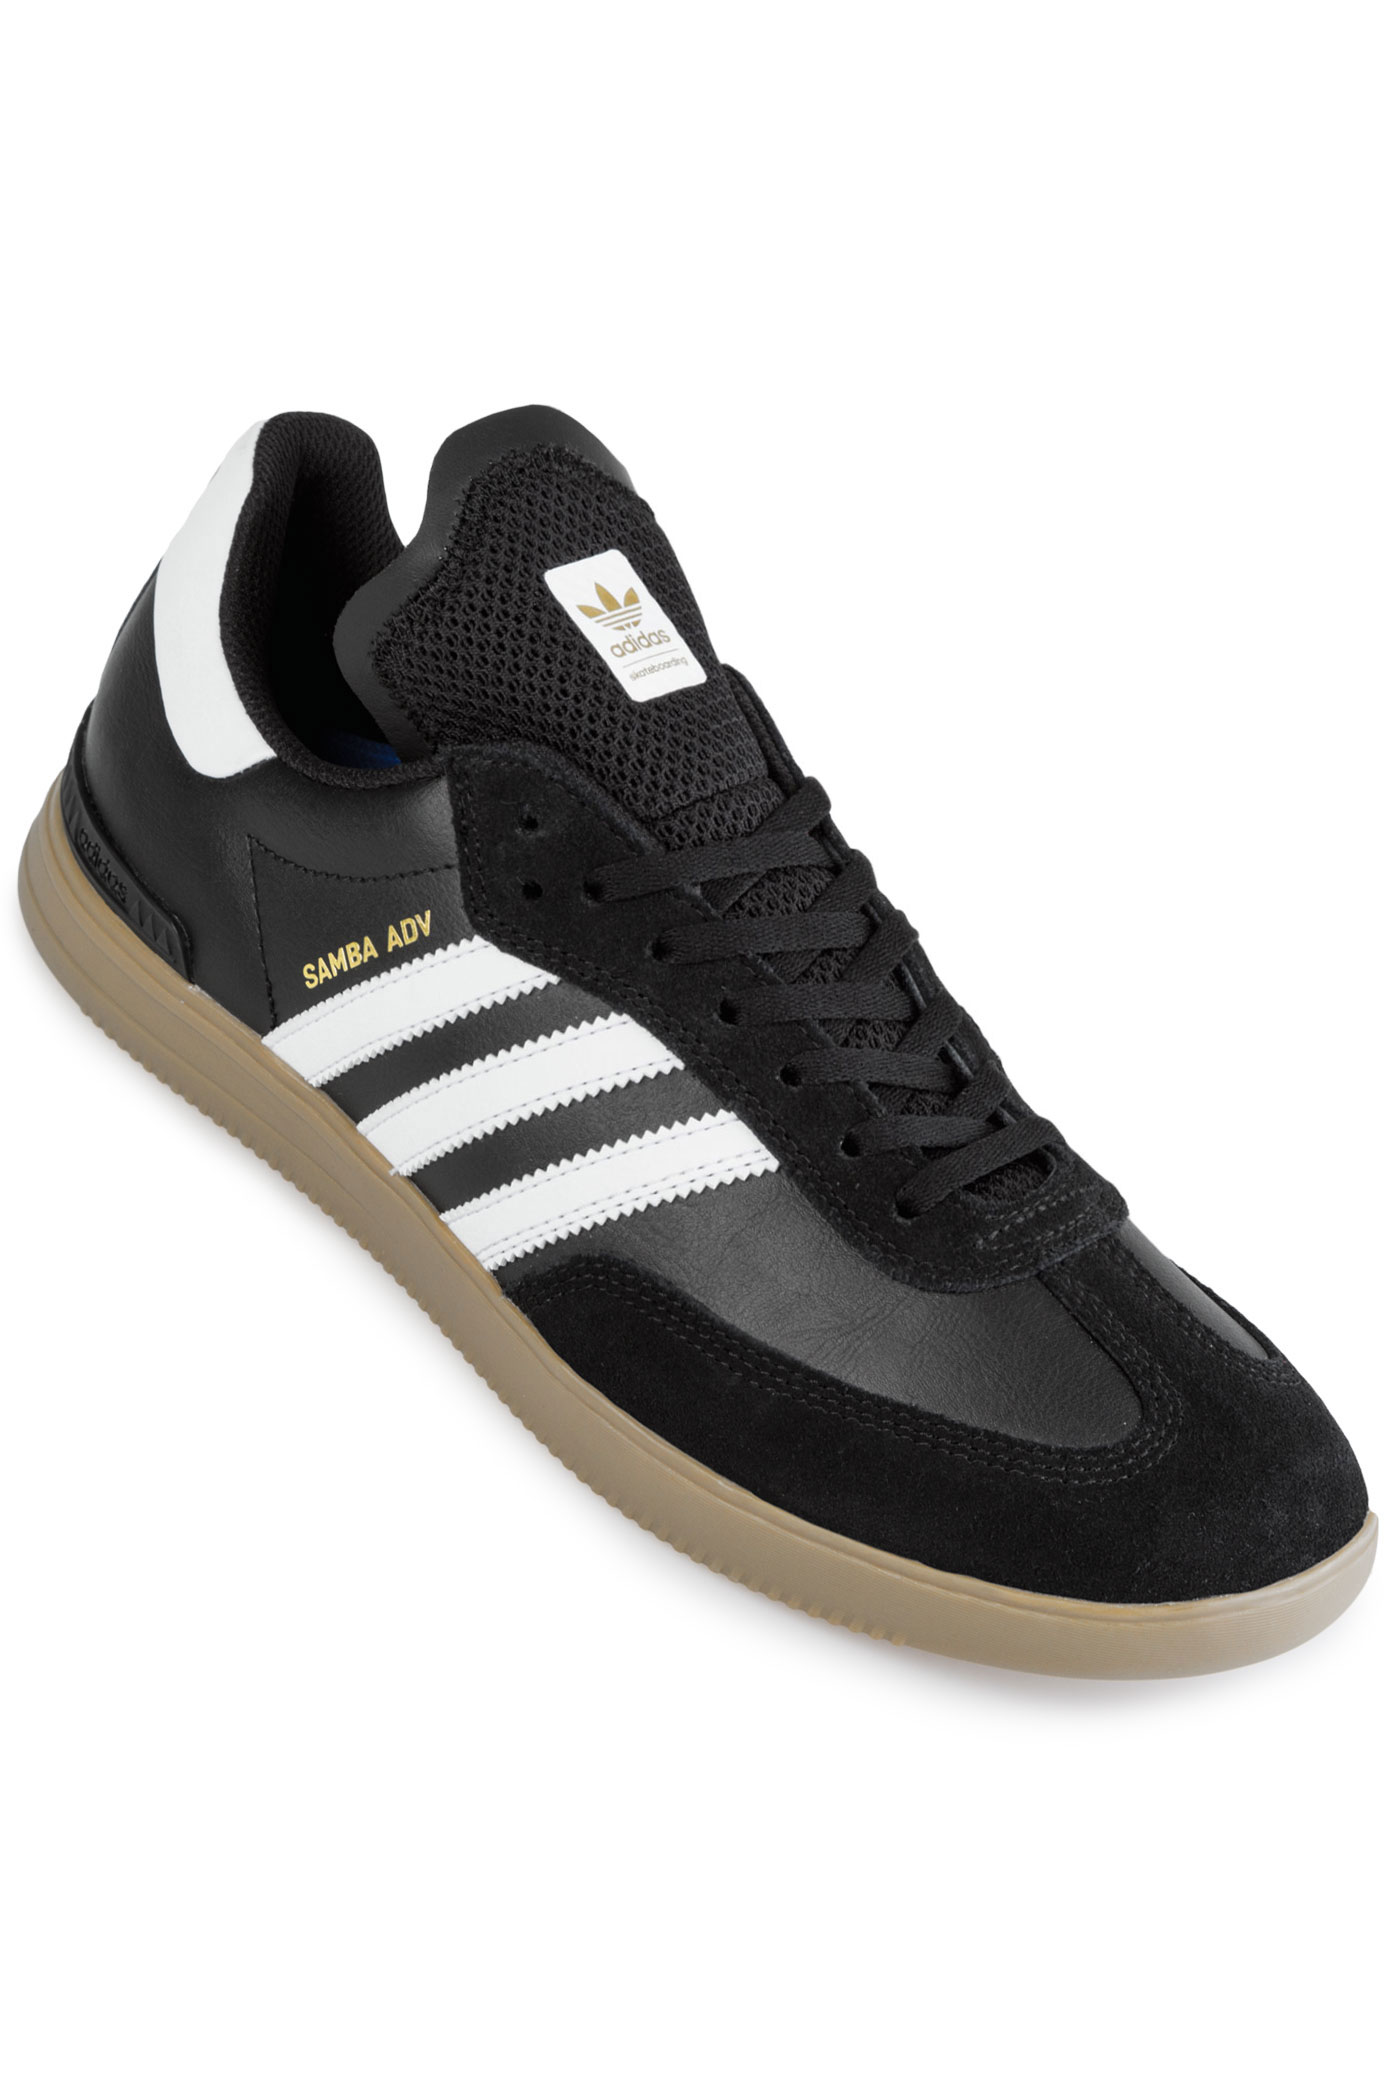 Adidas Black Adv Chaussurecore Samba White Skateboarding mnw8O0vN